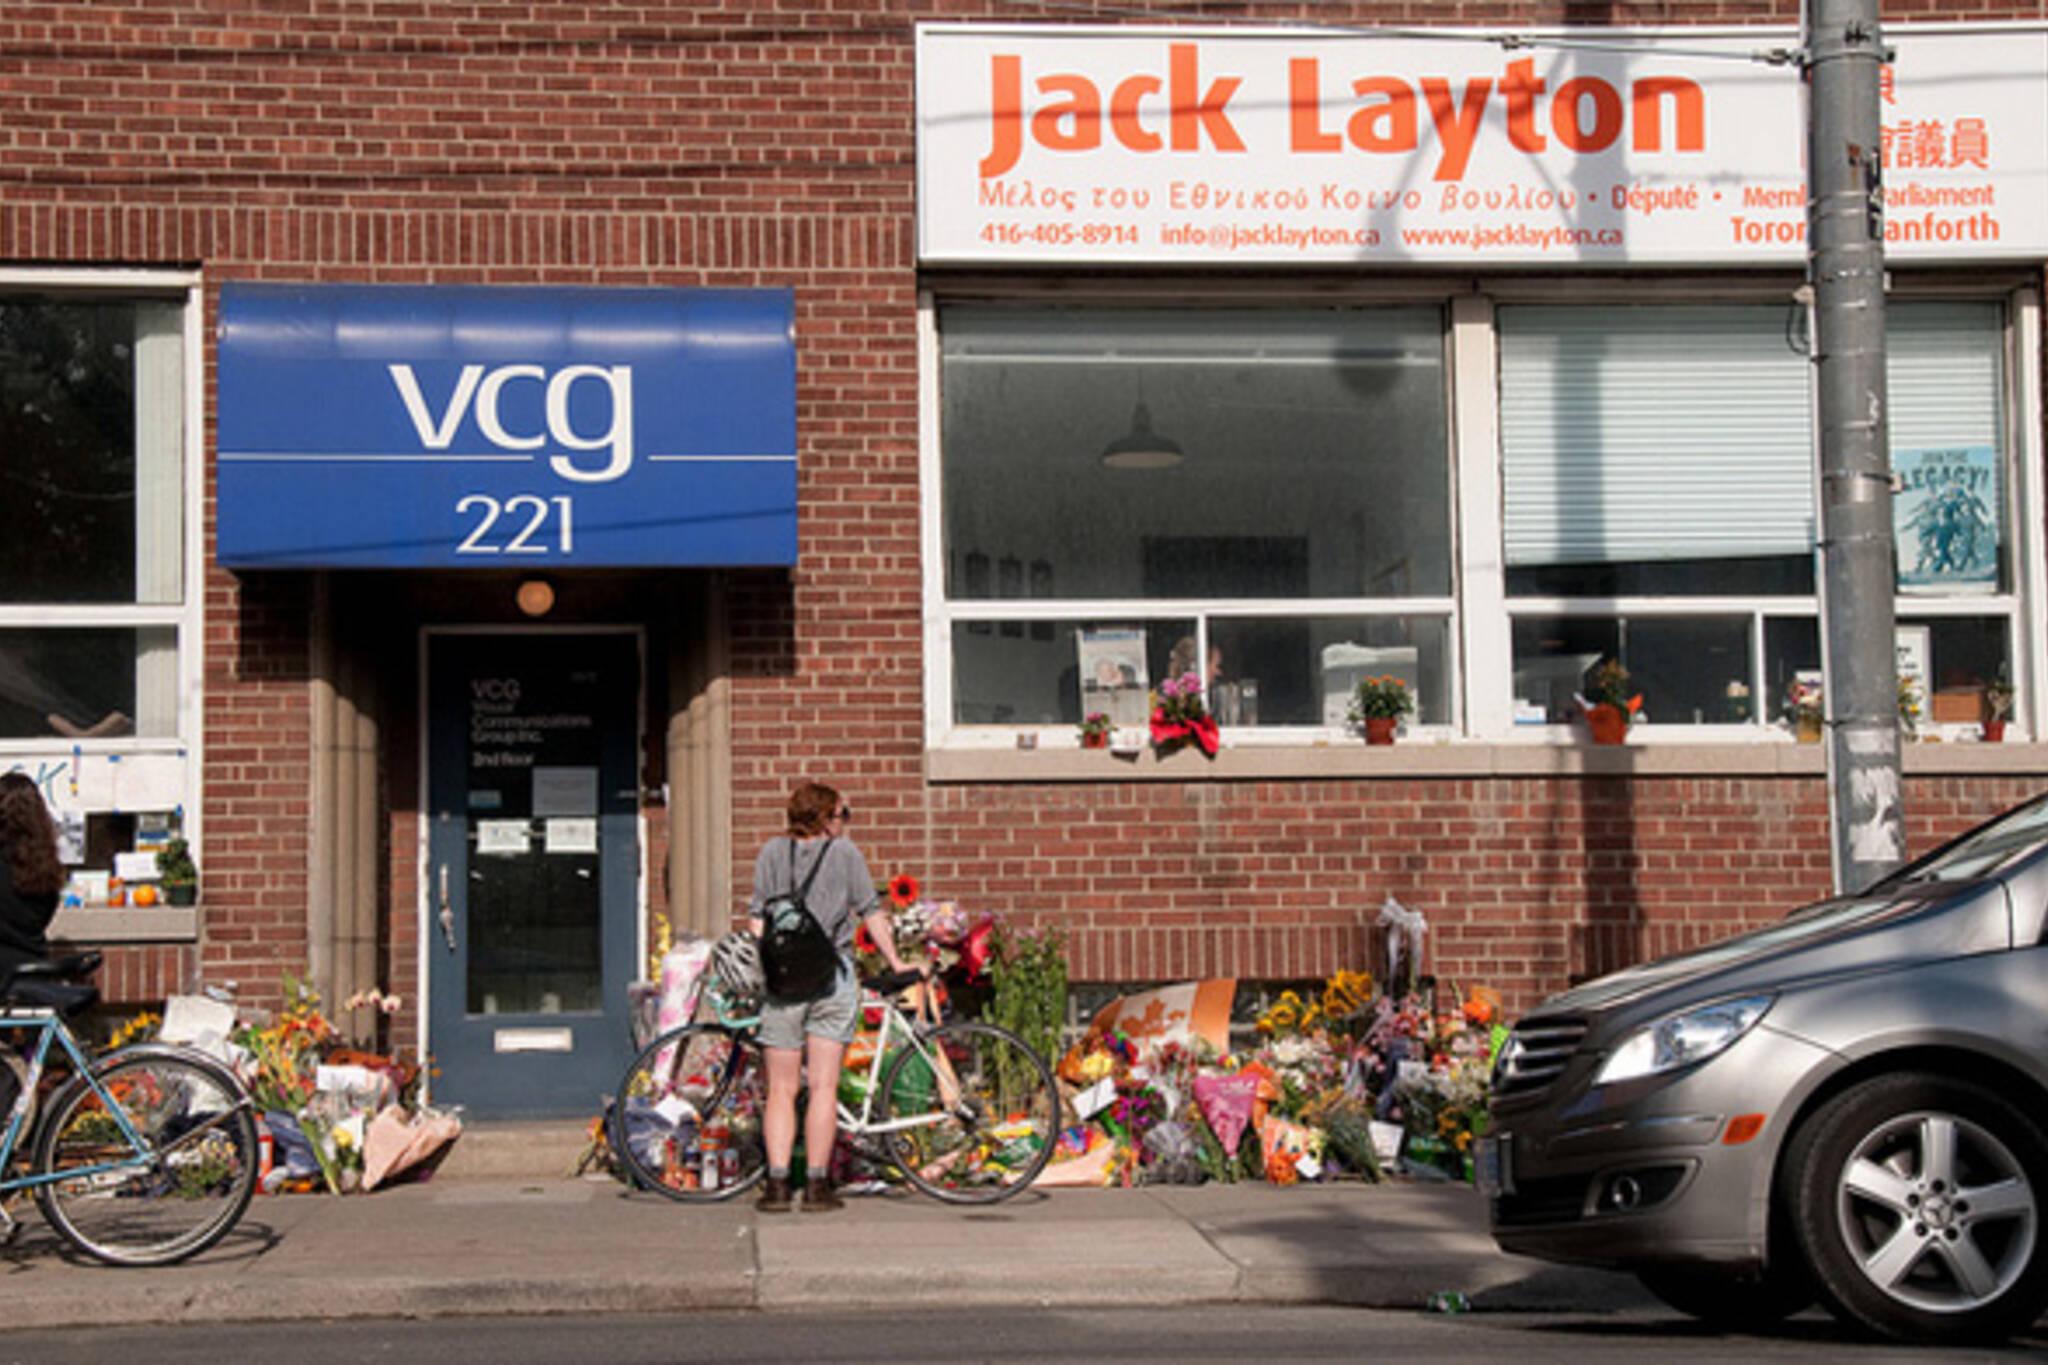 Jack Layton Office